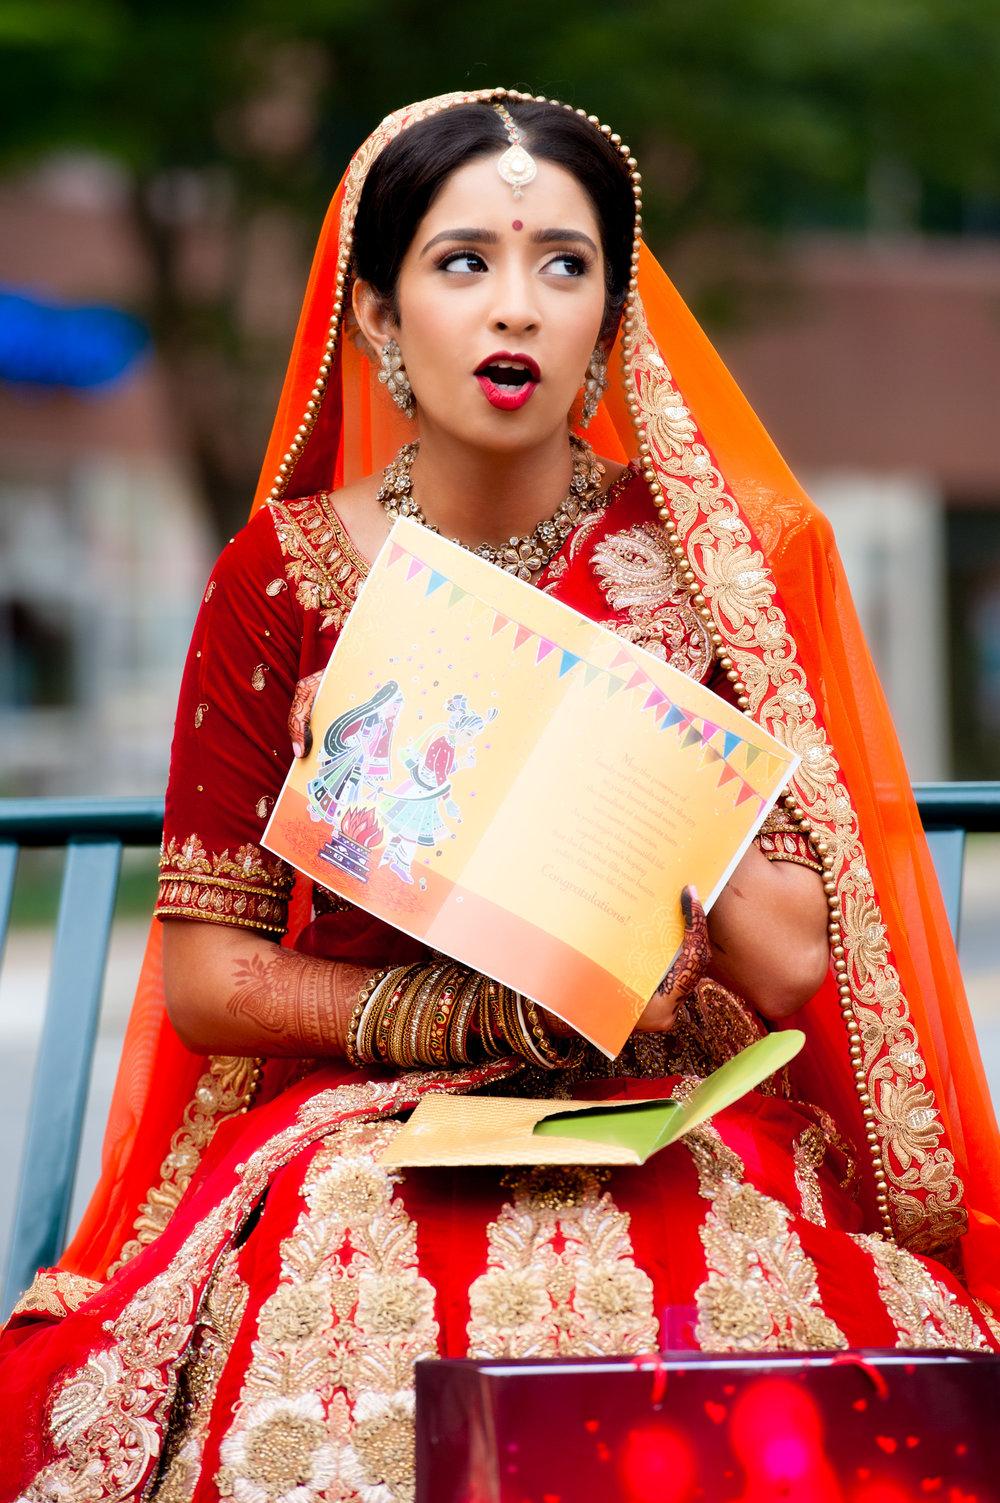 jonathan-mcphail-photography-nice-day-to-start-again-weddings-.jpg